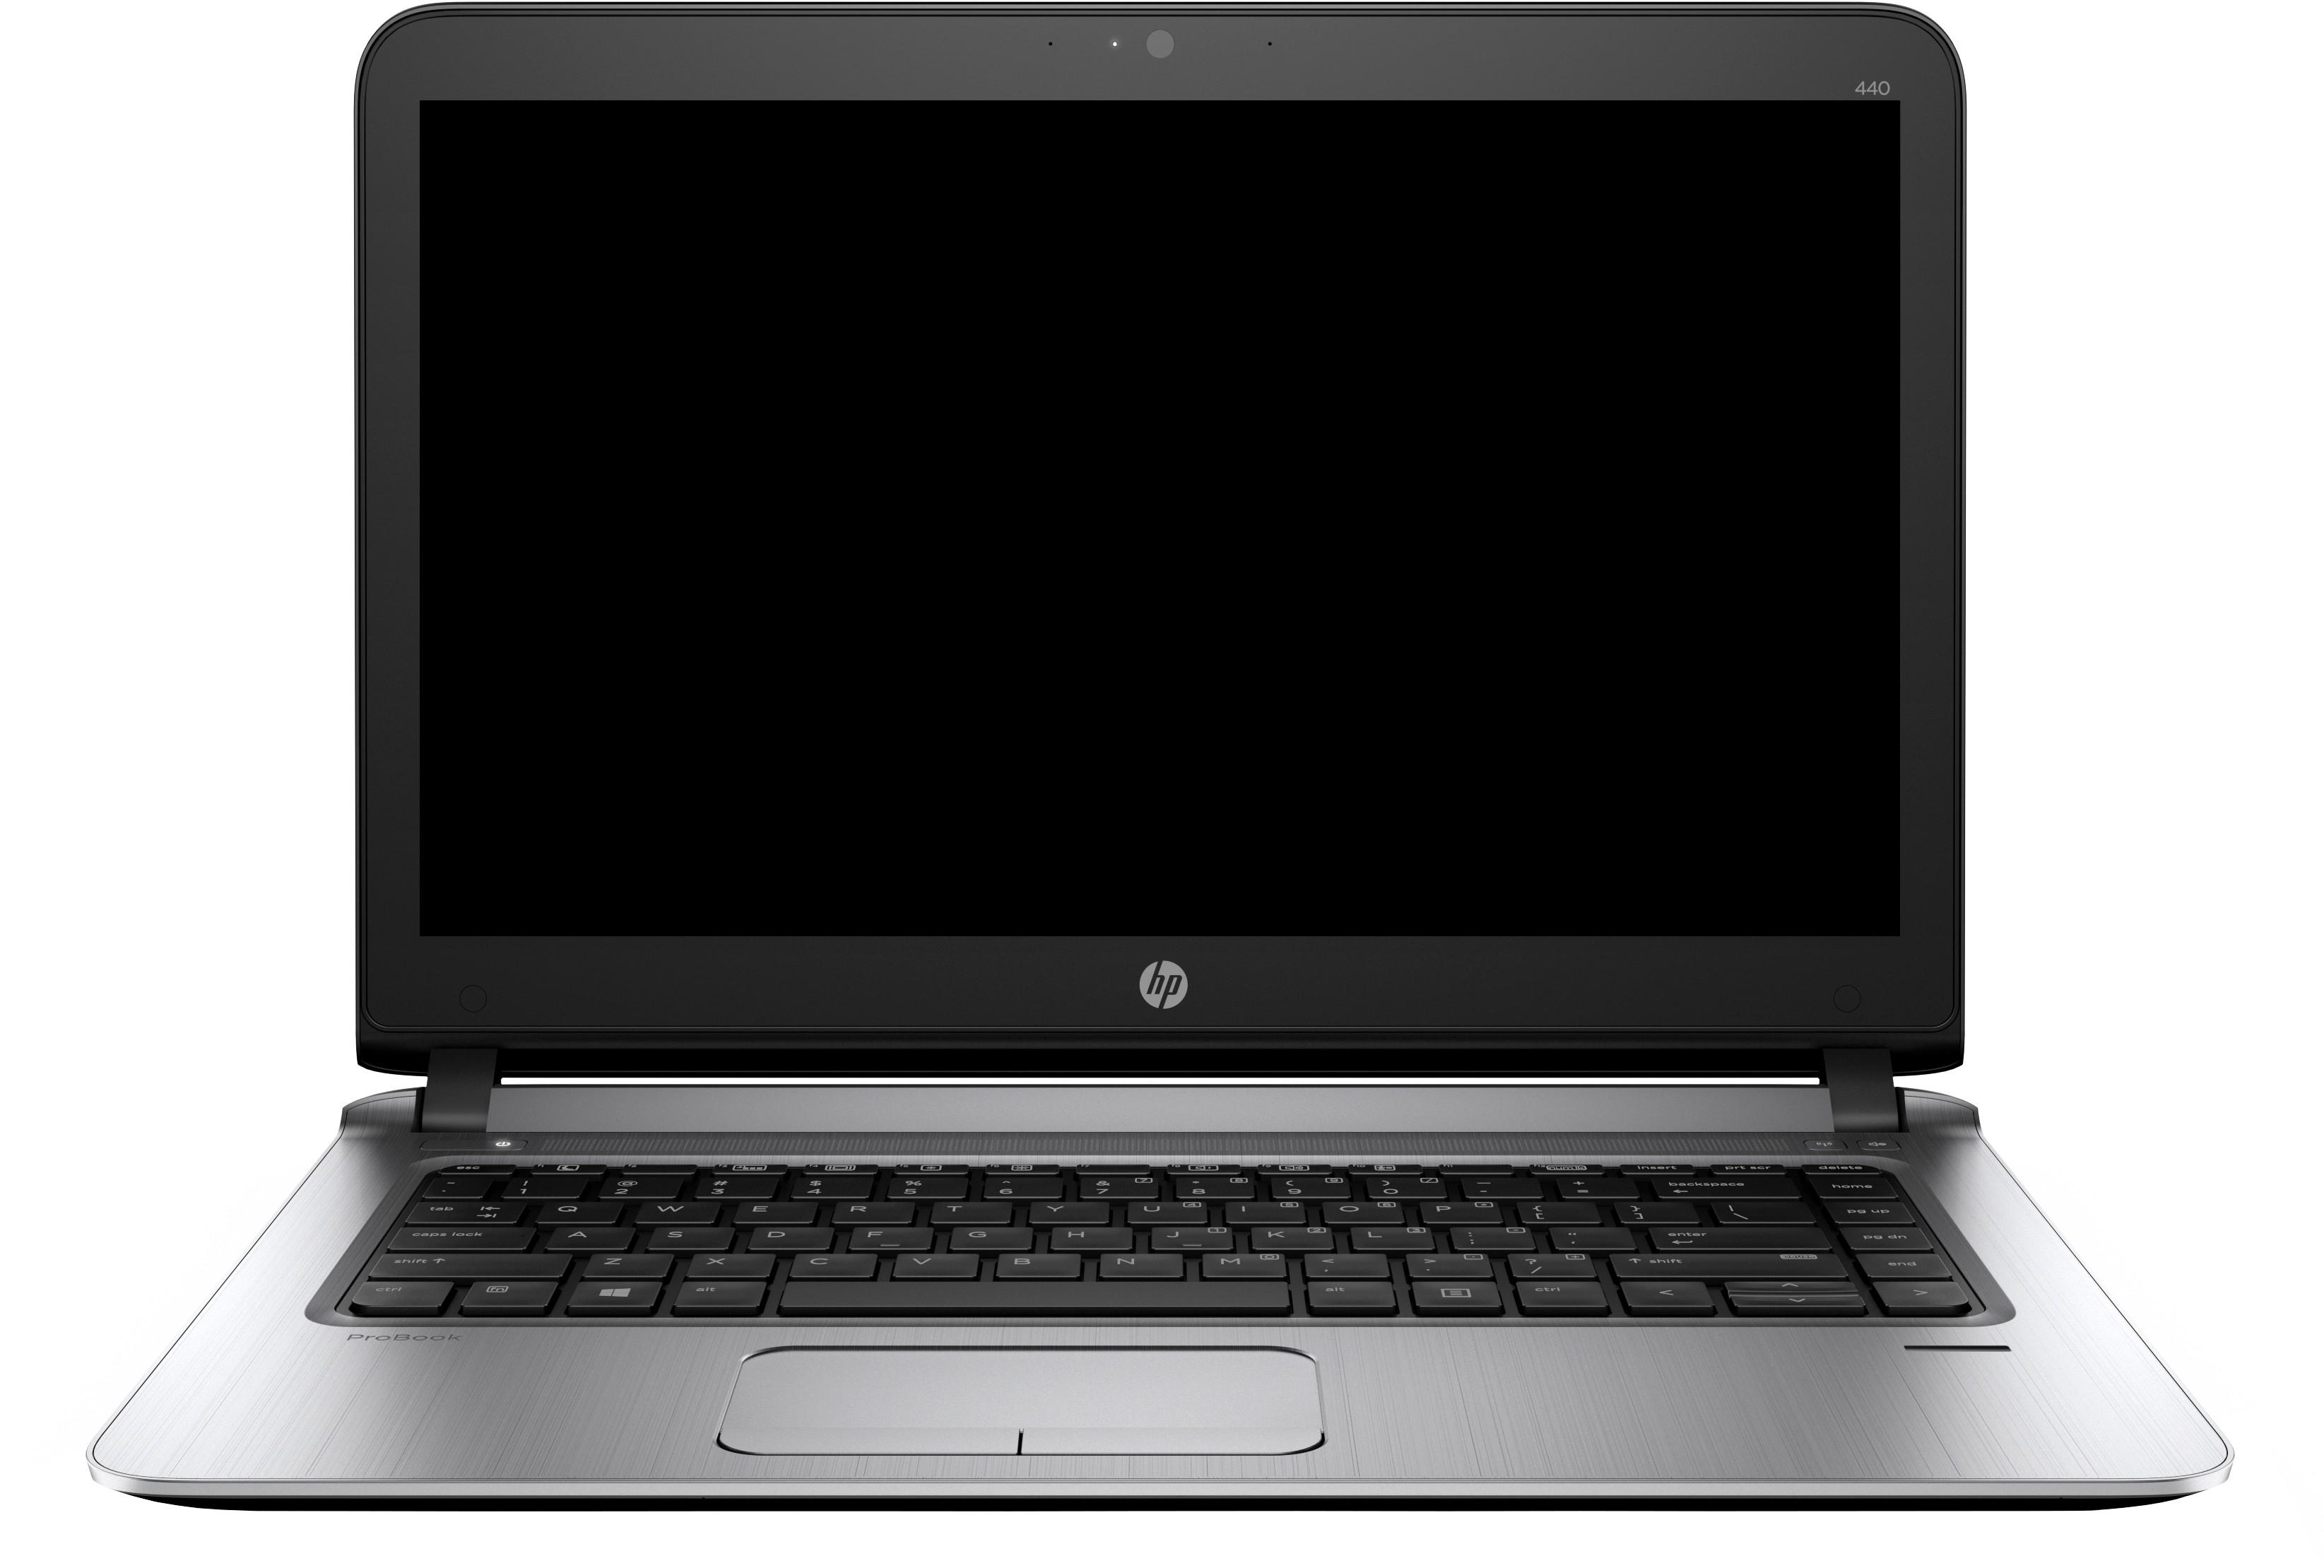 HP ProBook Core i3 7th Gen - (4 GB/500 GB HDD/DOS) 440 Laptop(14 inch, SIlver) image